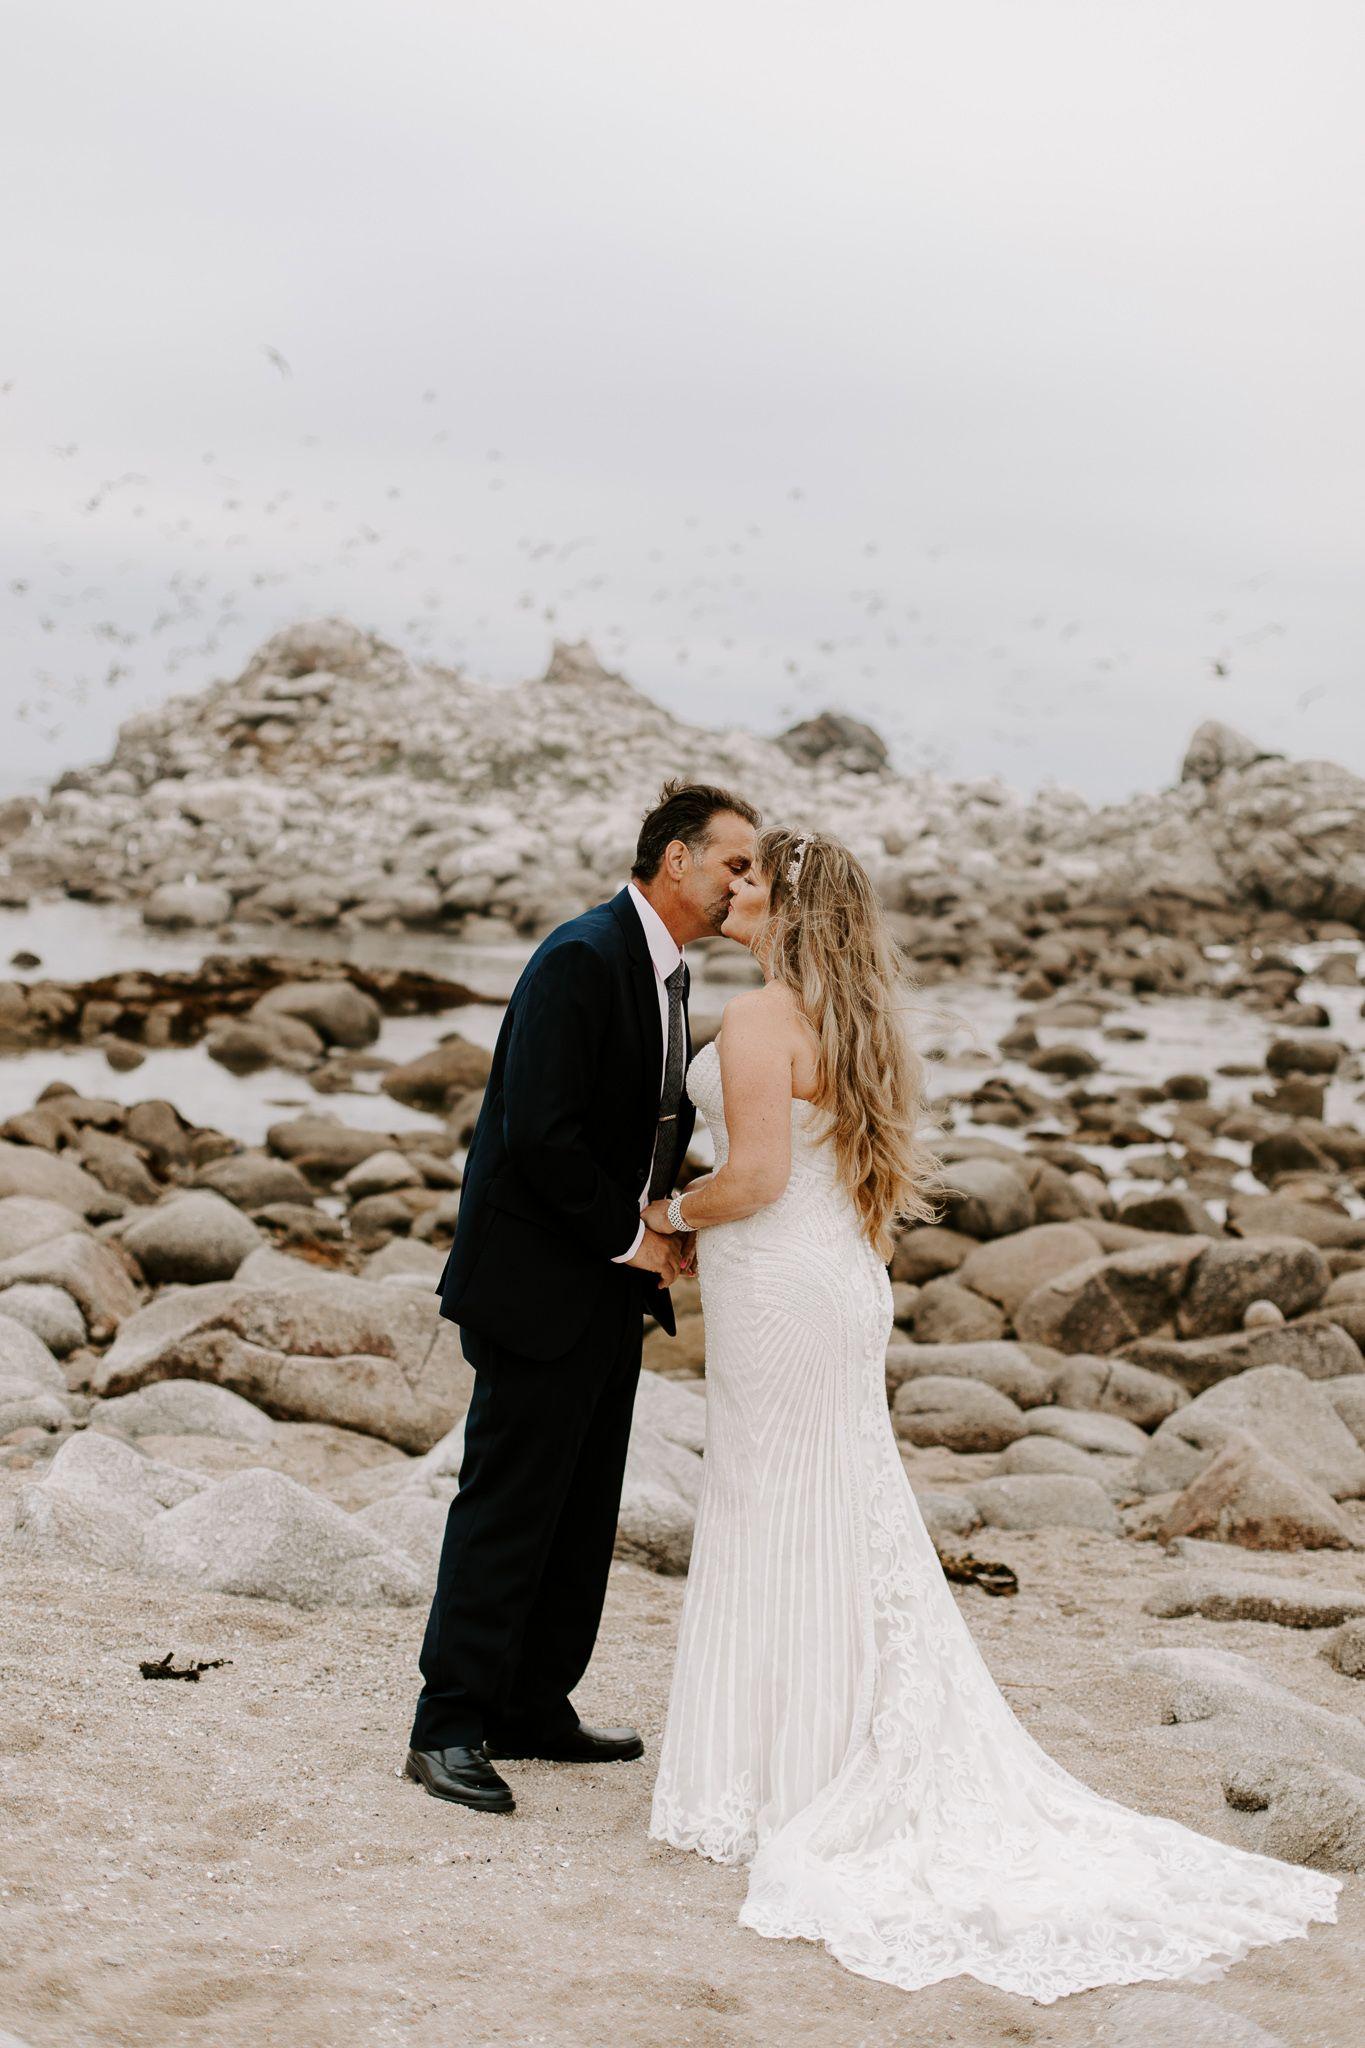 Al + Toni Pacific Grove, California Elopement Romantic